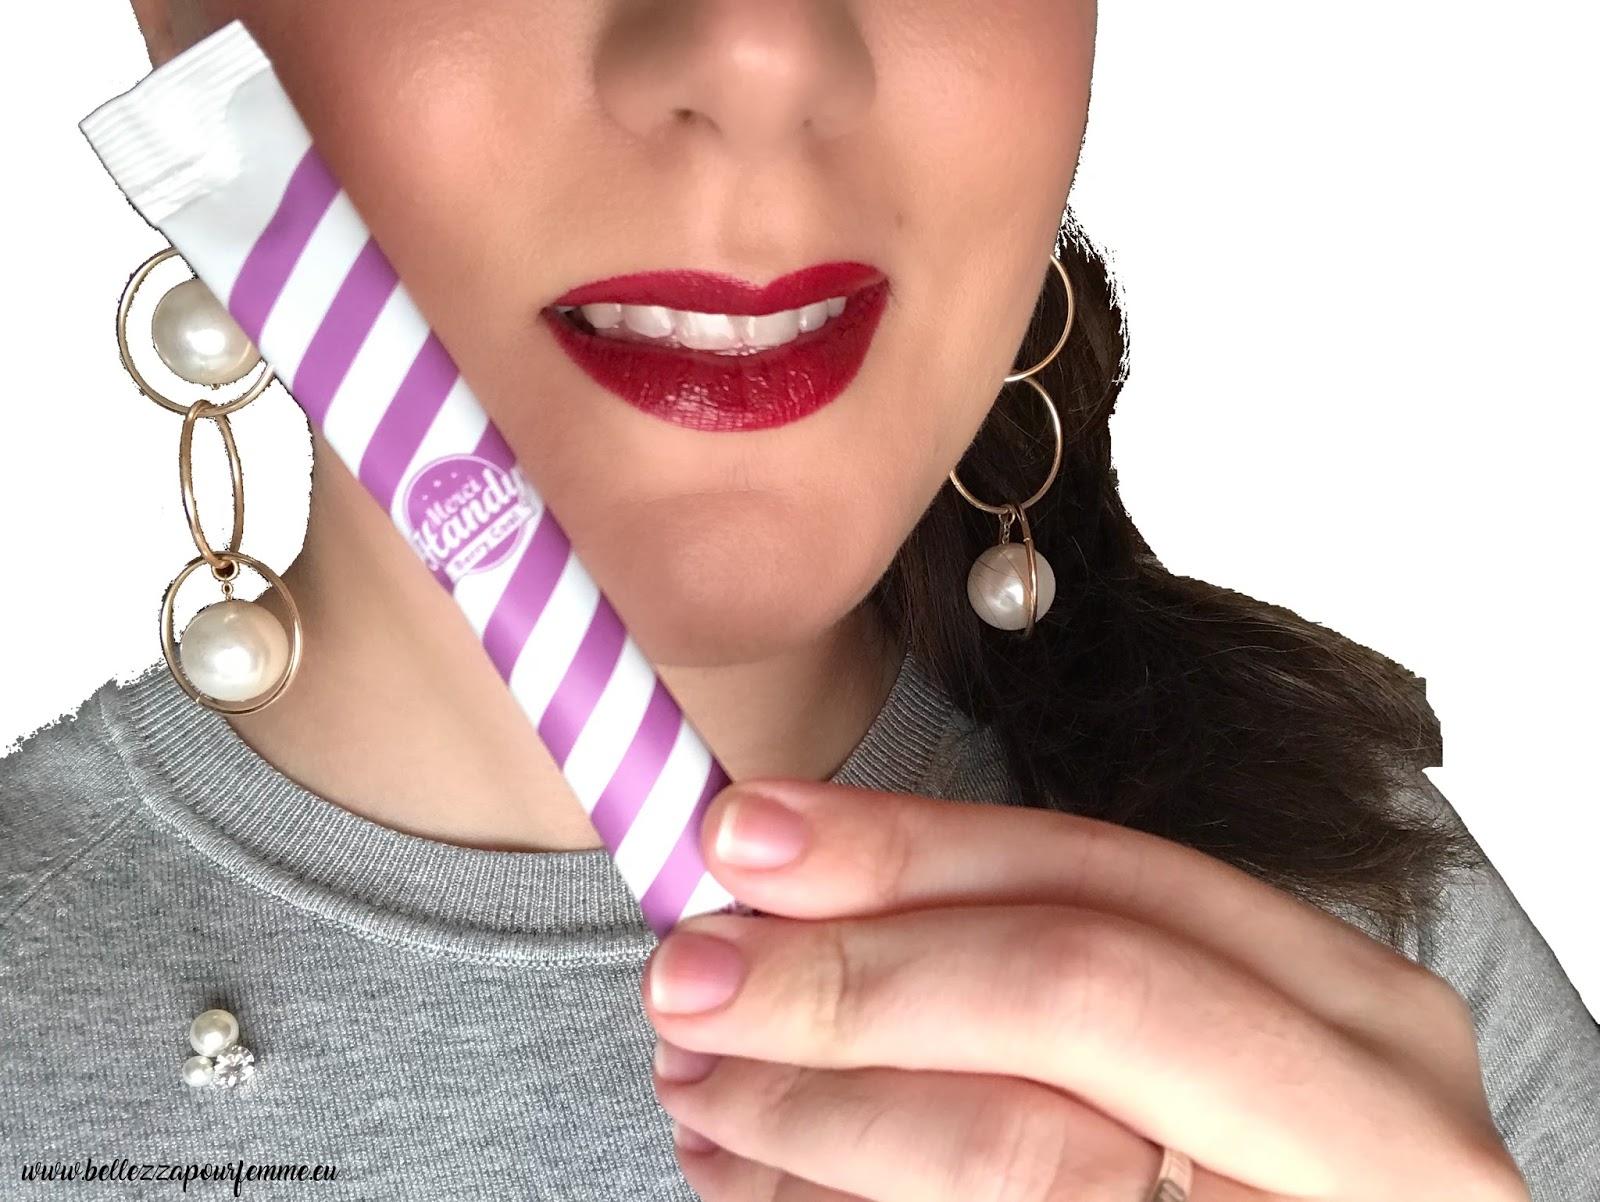 Denti più bianchi con i kit Love & Smile Detox Merci Handy